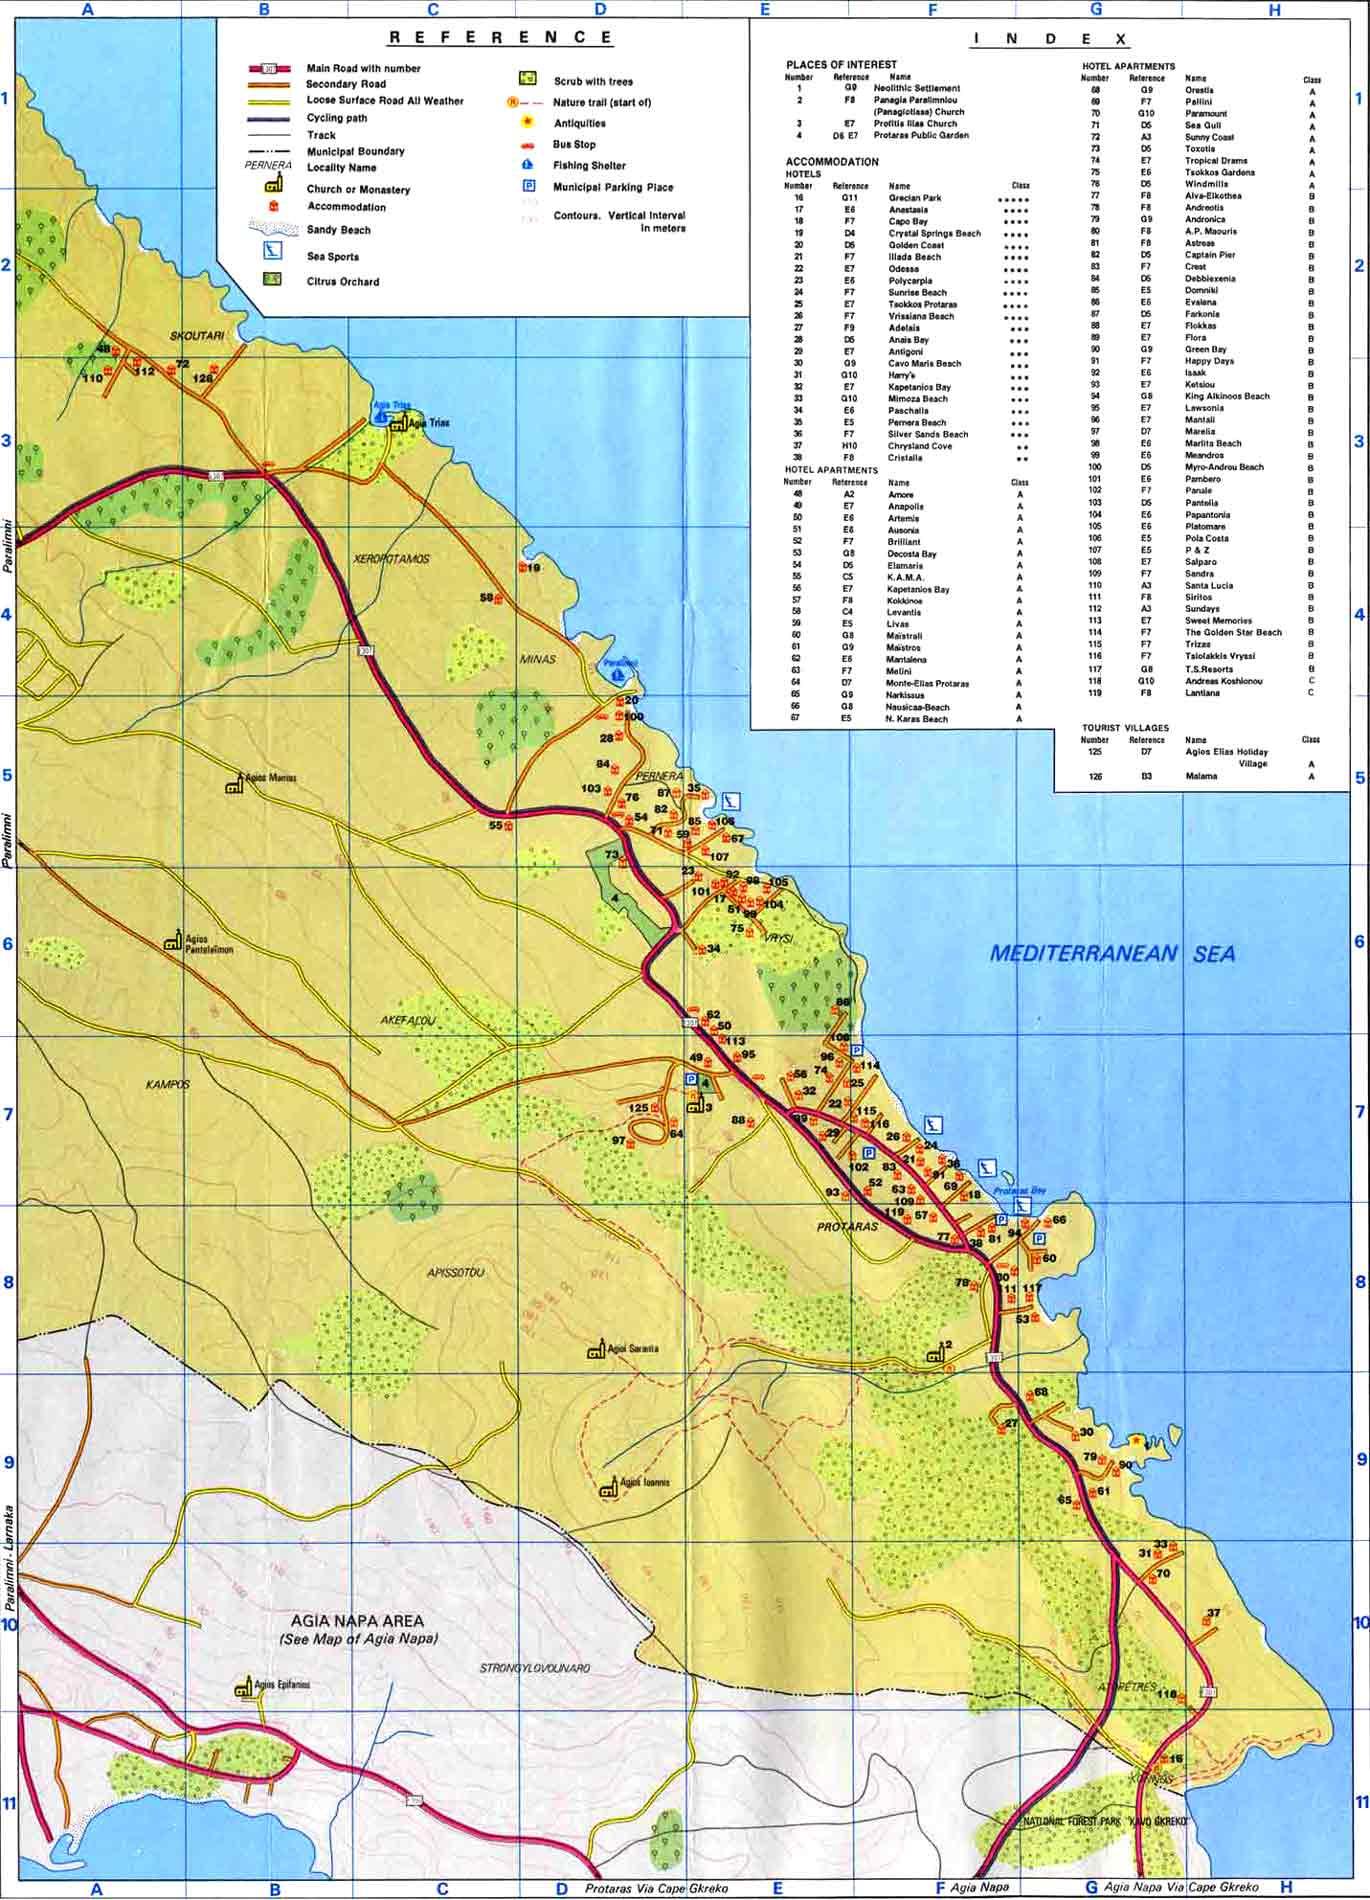 Famagusta Maps Ayia Napa Map and Protaras Map